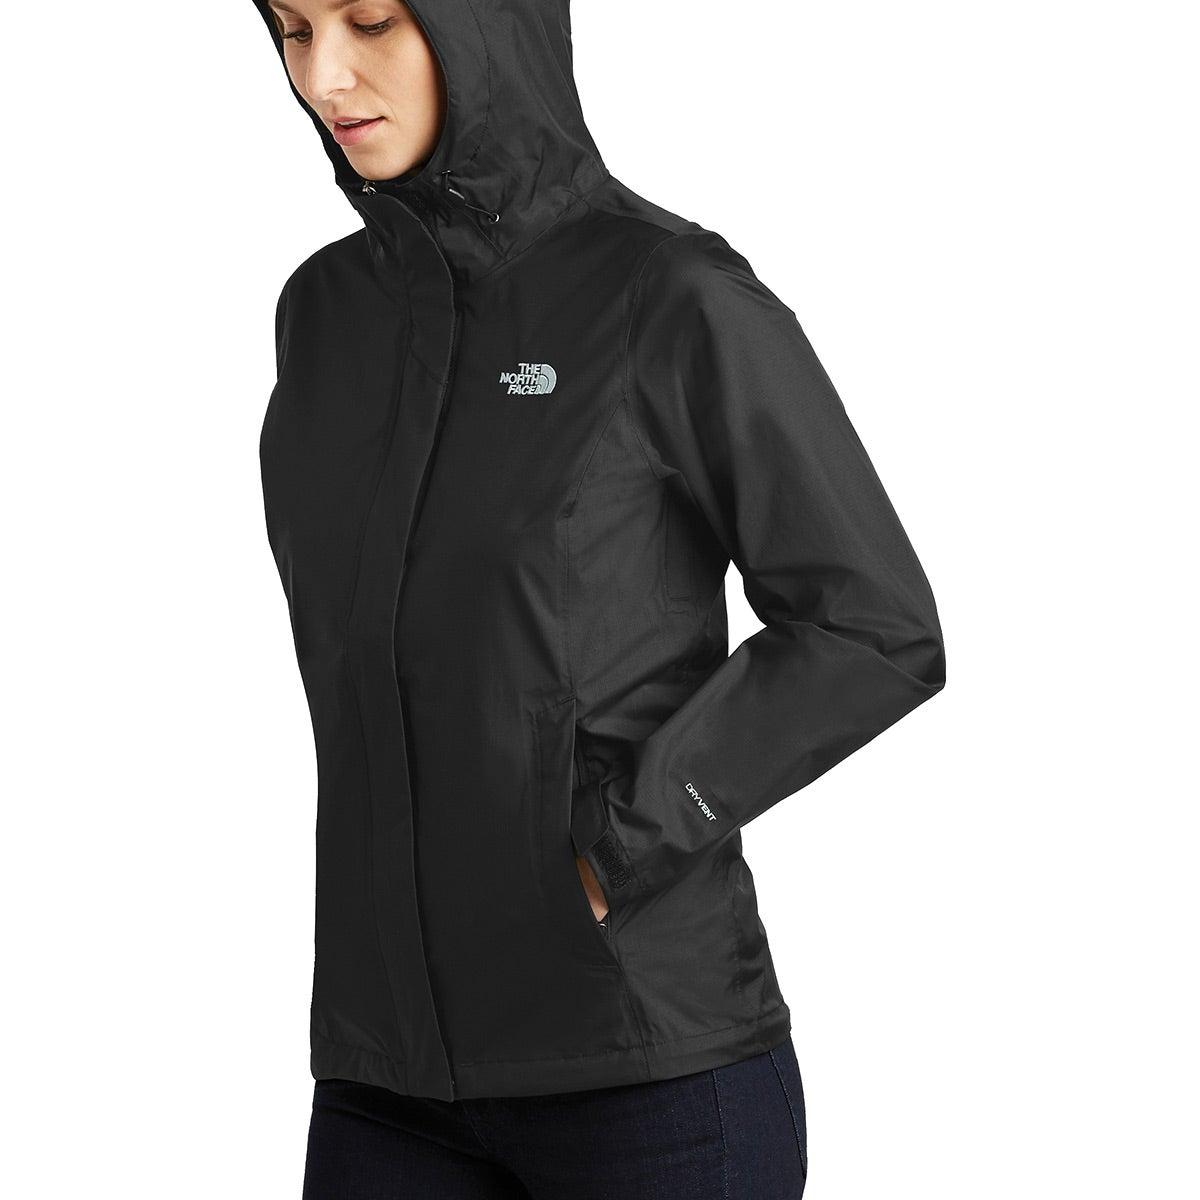 bc5c11bae The North Face DryVent Rain Jacket (Women's)